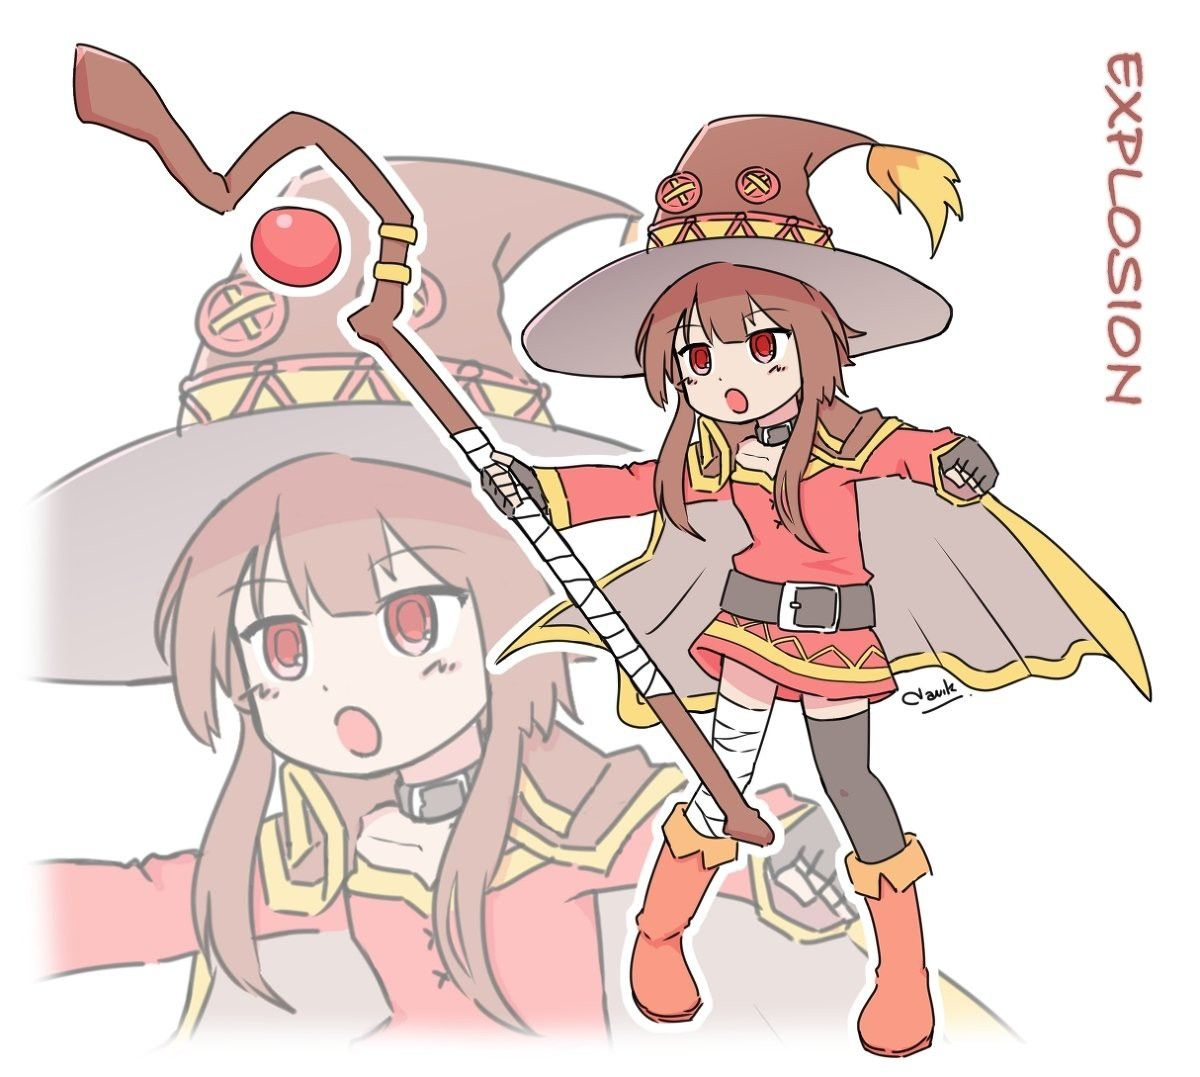 Pin by LoneRifter on Konosuba Anime funny, Chibi, Anime